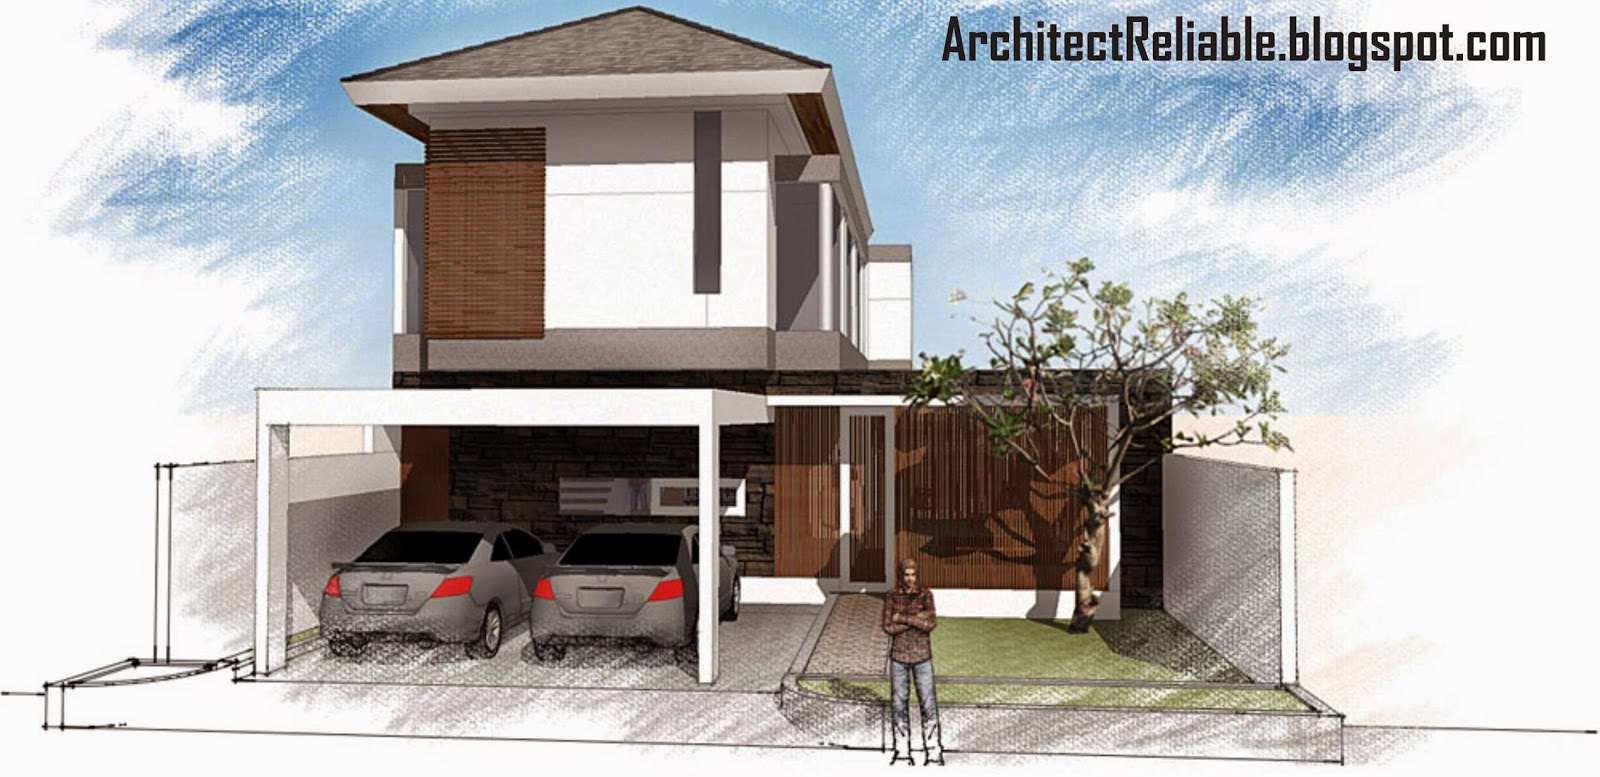 desain architect: tropical minimalist house models